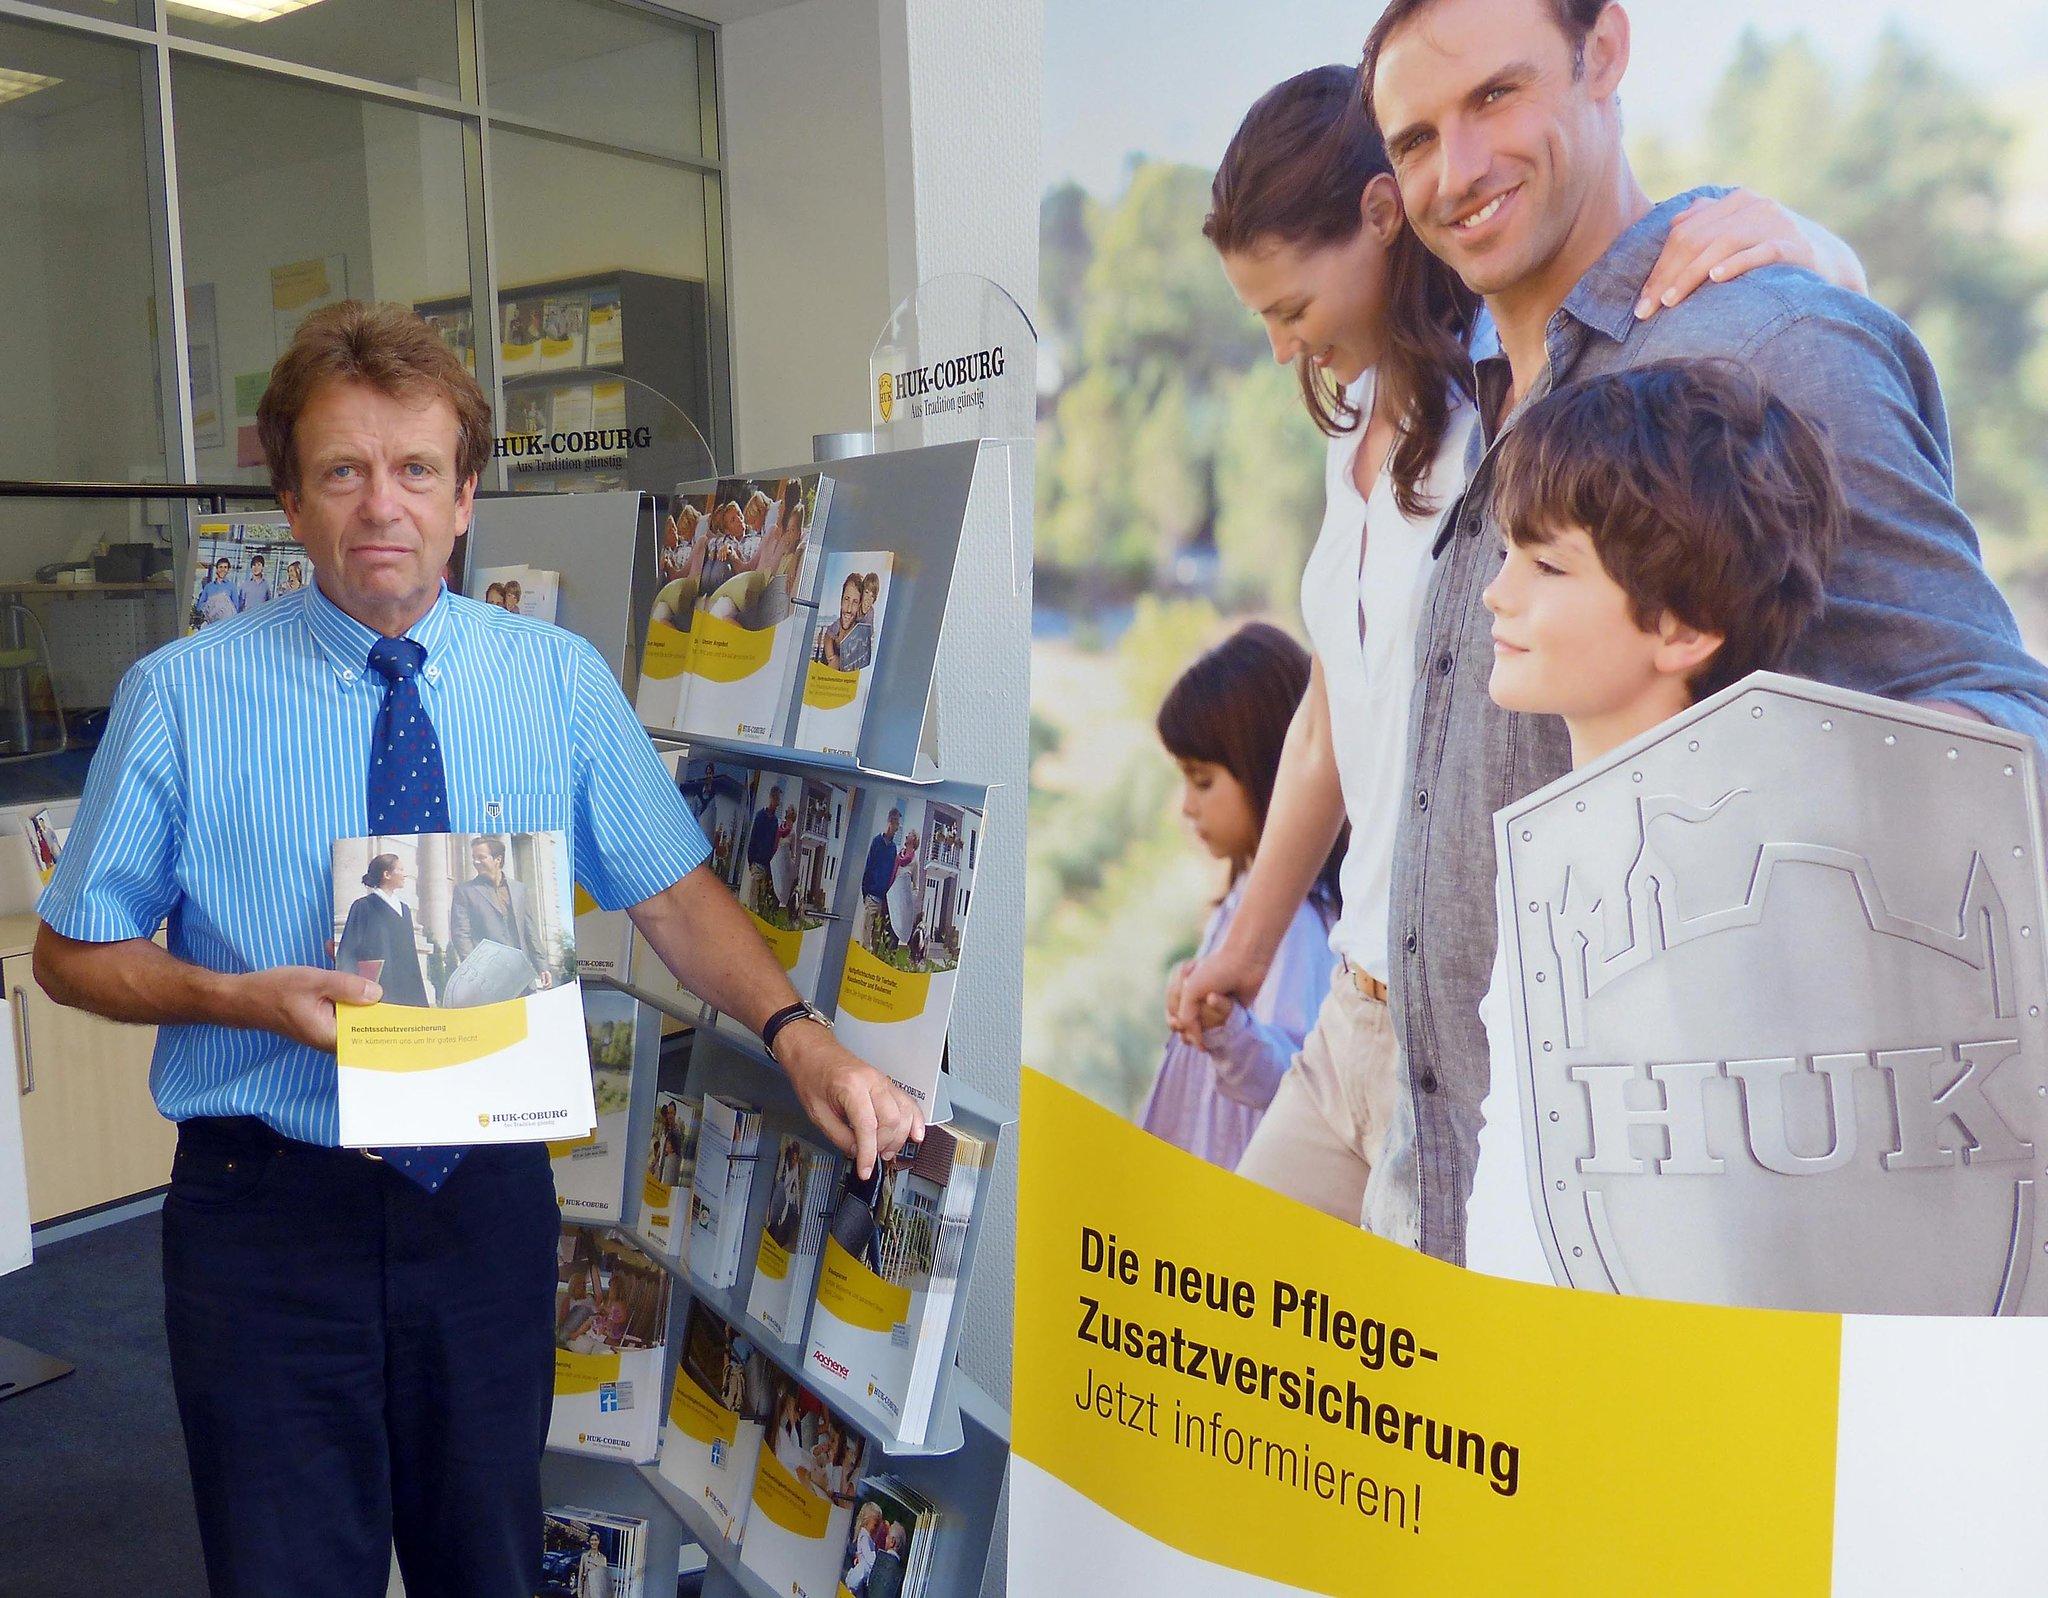 Thomas Voss Leitet Huk Coburg Buro In Aplerbeck Dortmund Sud